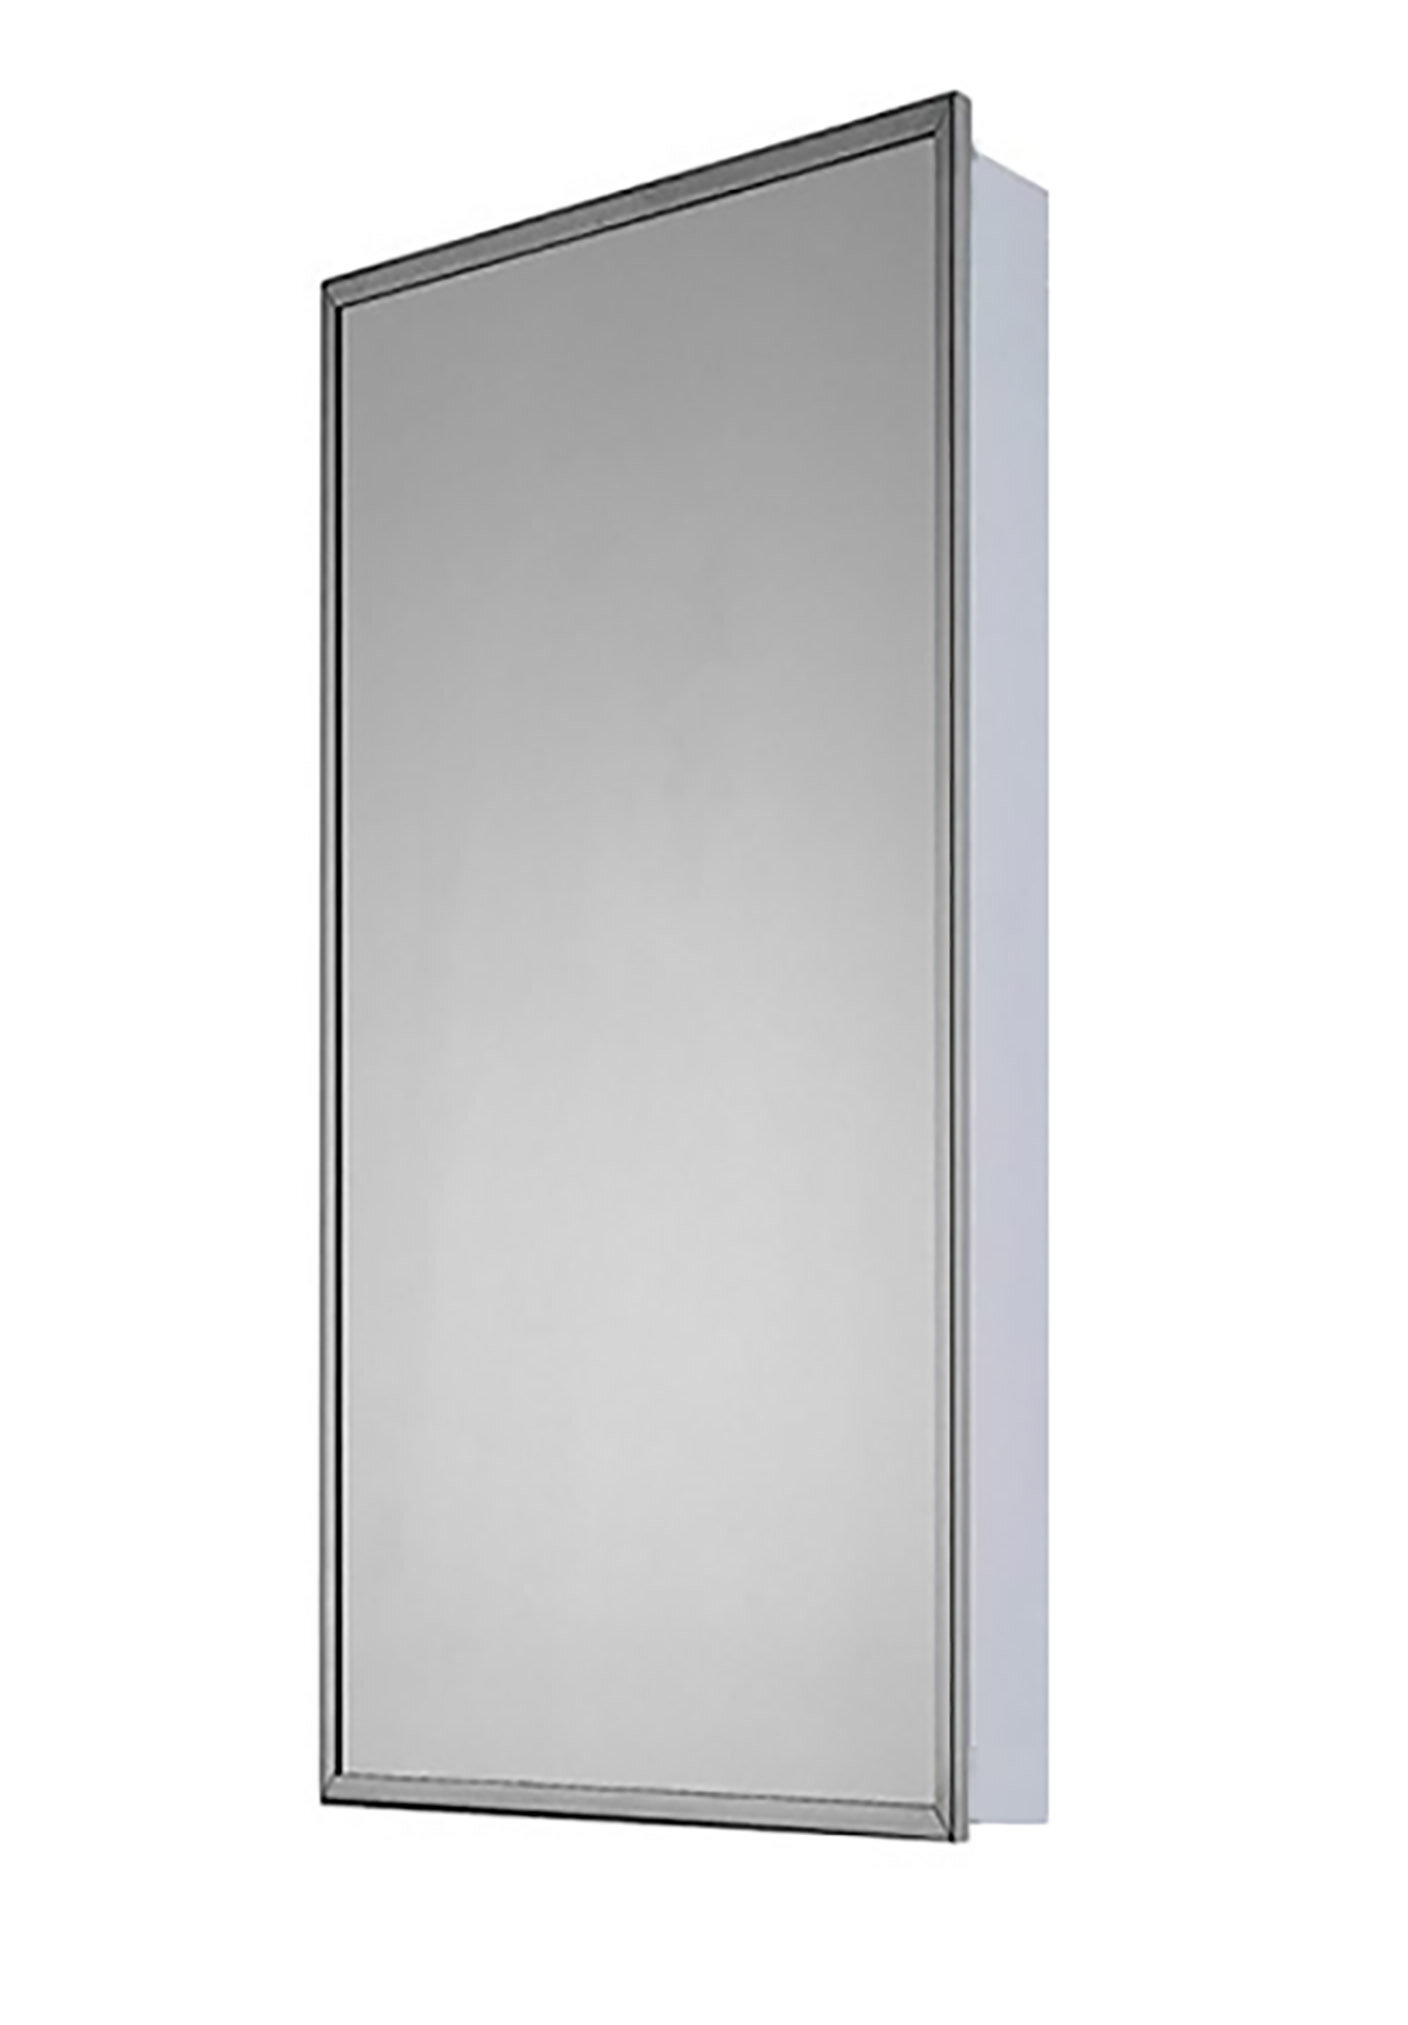 Winston Porter Norita Surface Mount Framed 1 Door Medicine Cabinet With 7 Adjustable Shelves Wayfair